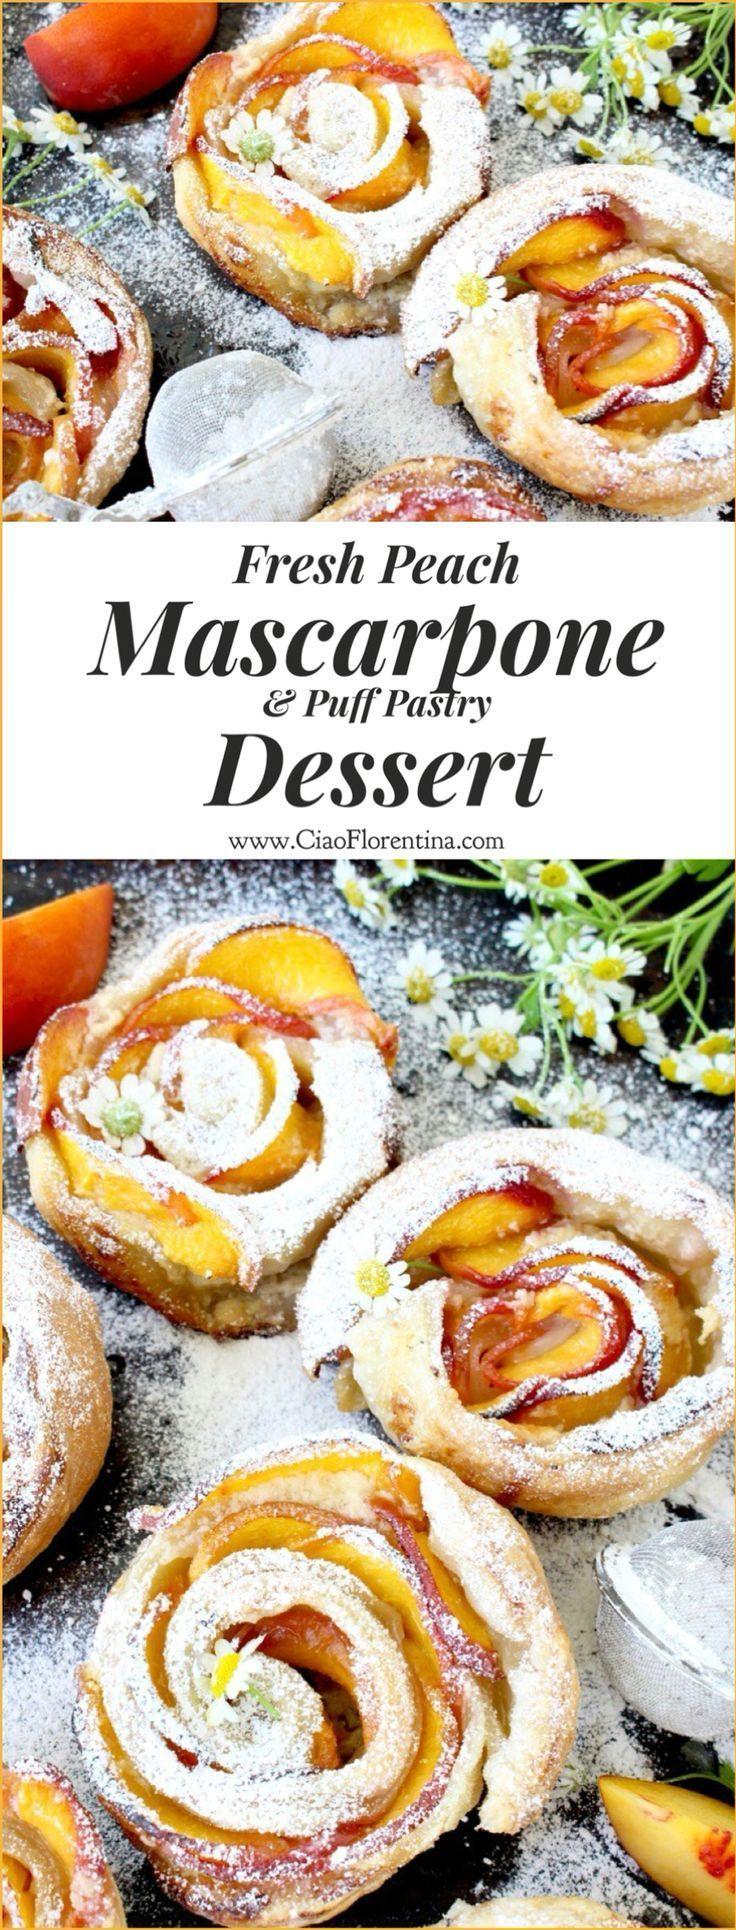 Fresh Peach Dessert Recipe with Mascarpone, Vanilla Bean and Flaky Puff Pastry   @CiaoFlorentina